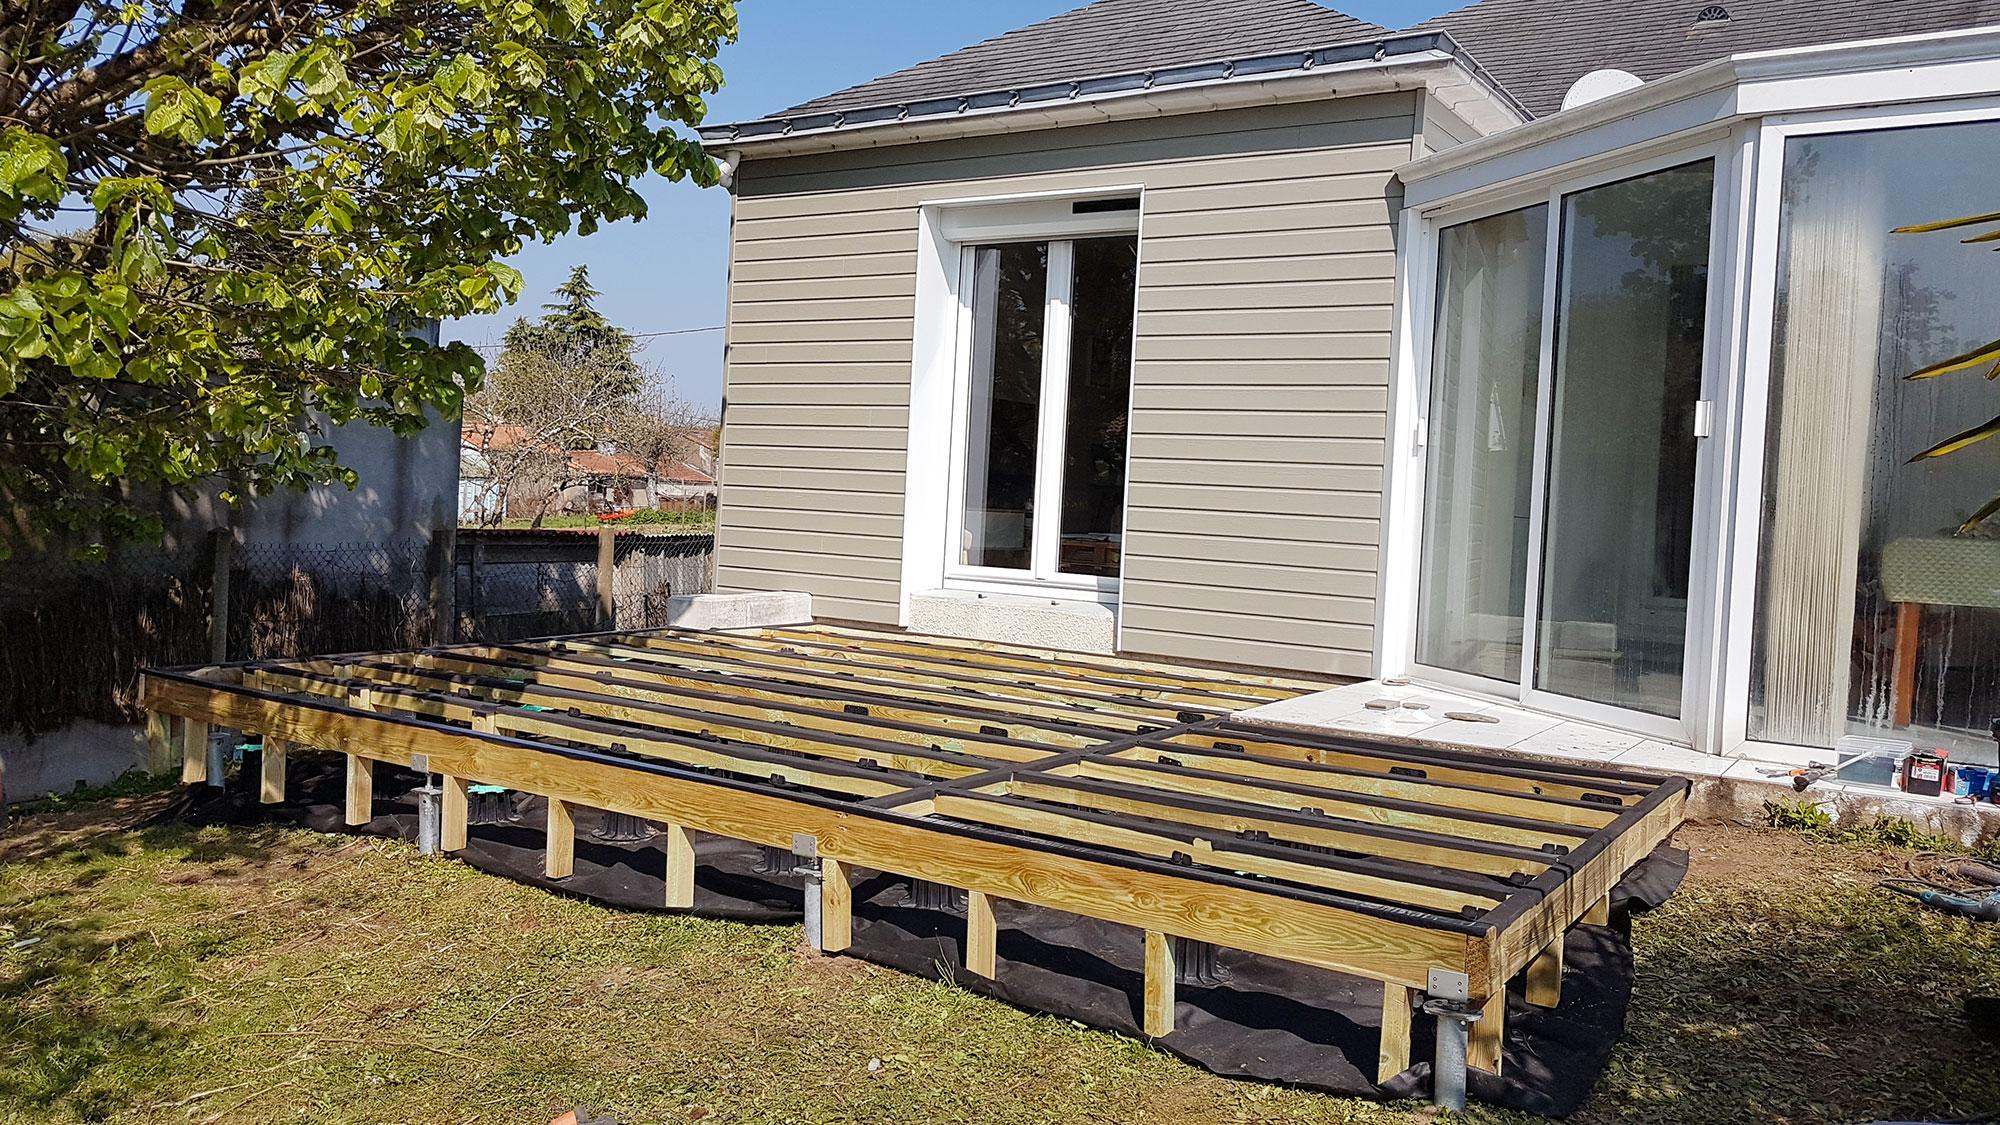 Construire Une Terrasse En Bois Surelevee contruire une terrasse | tendance bardage & terrasse